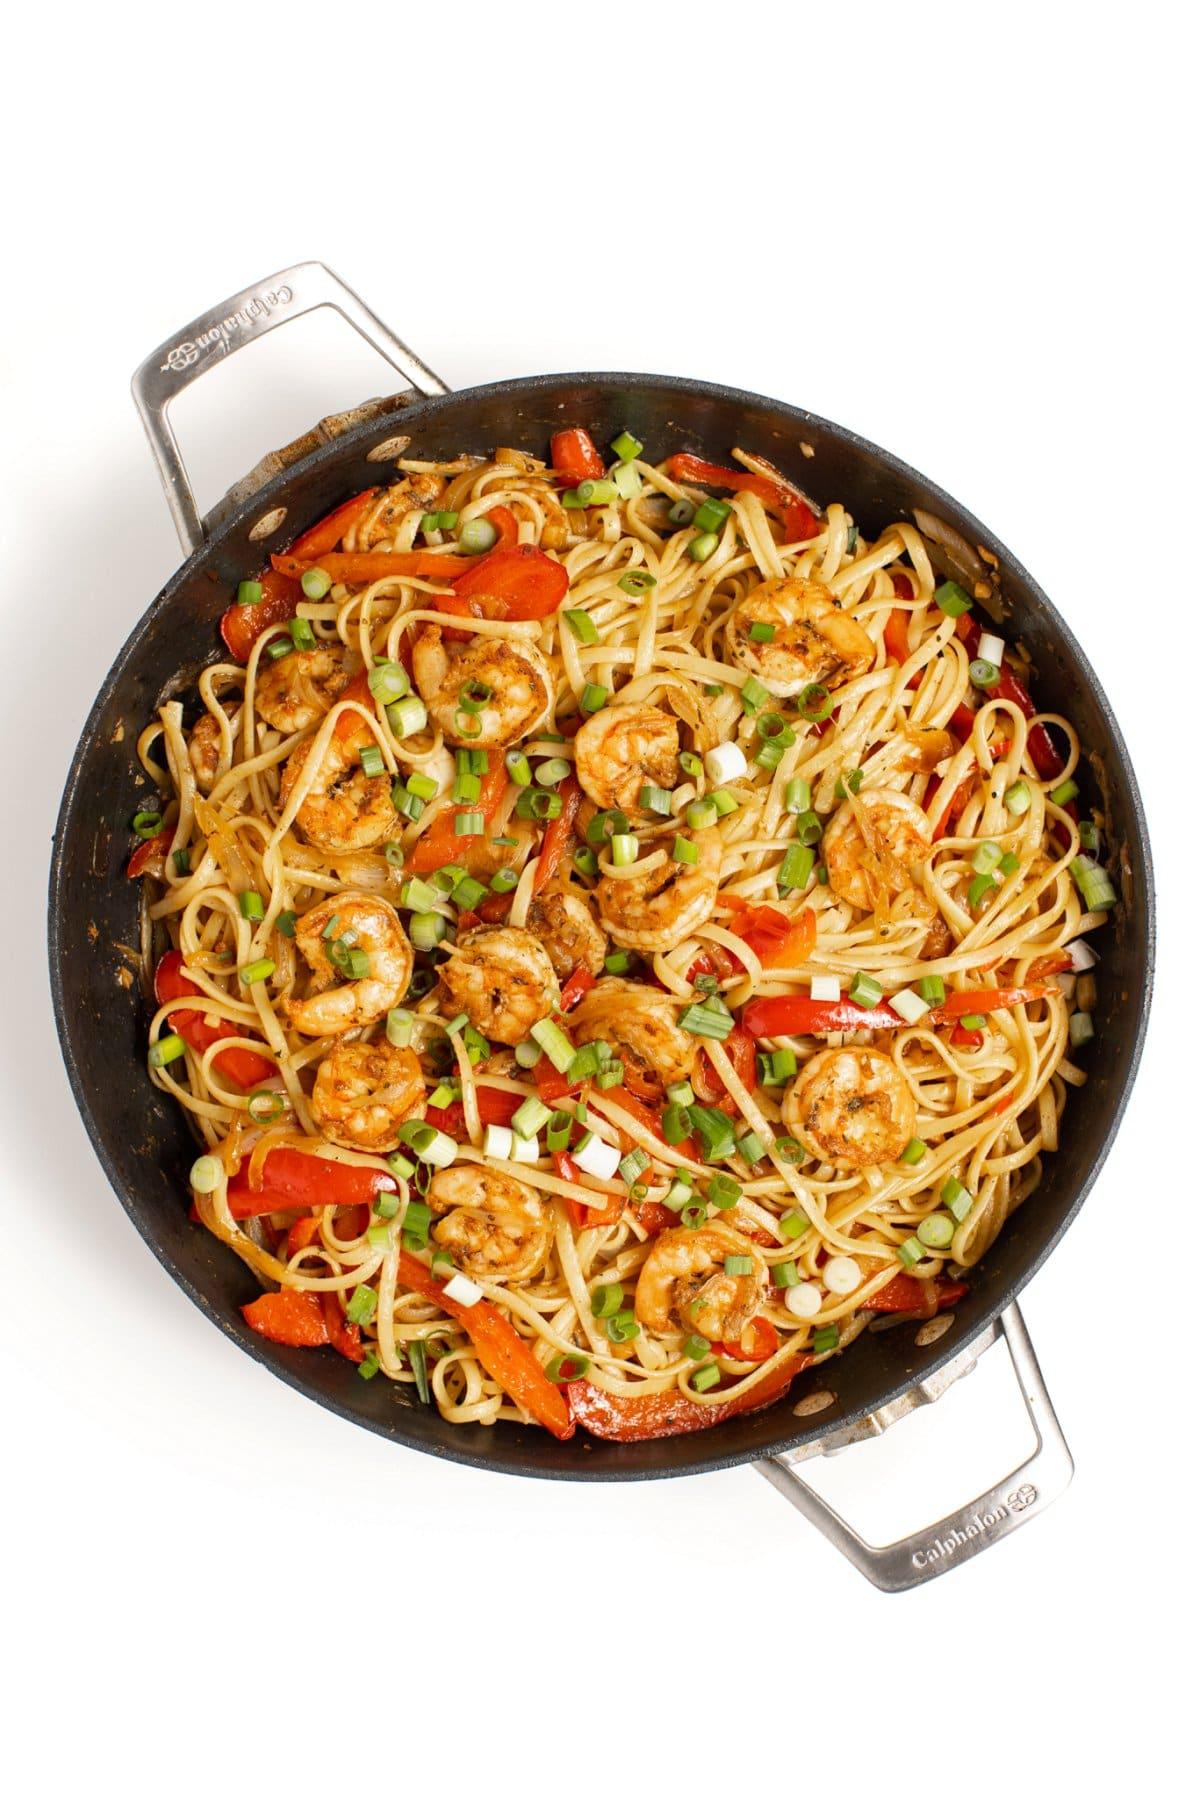 Cajun Shrimp Pasta garnished with scallions